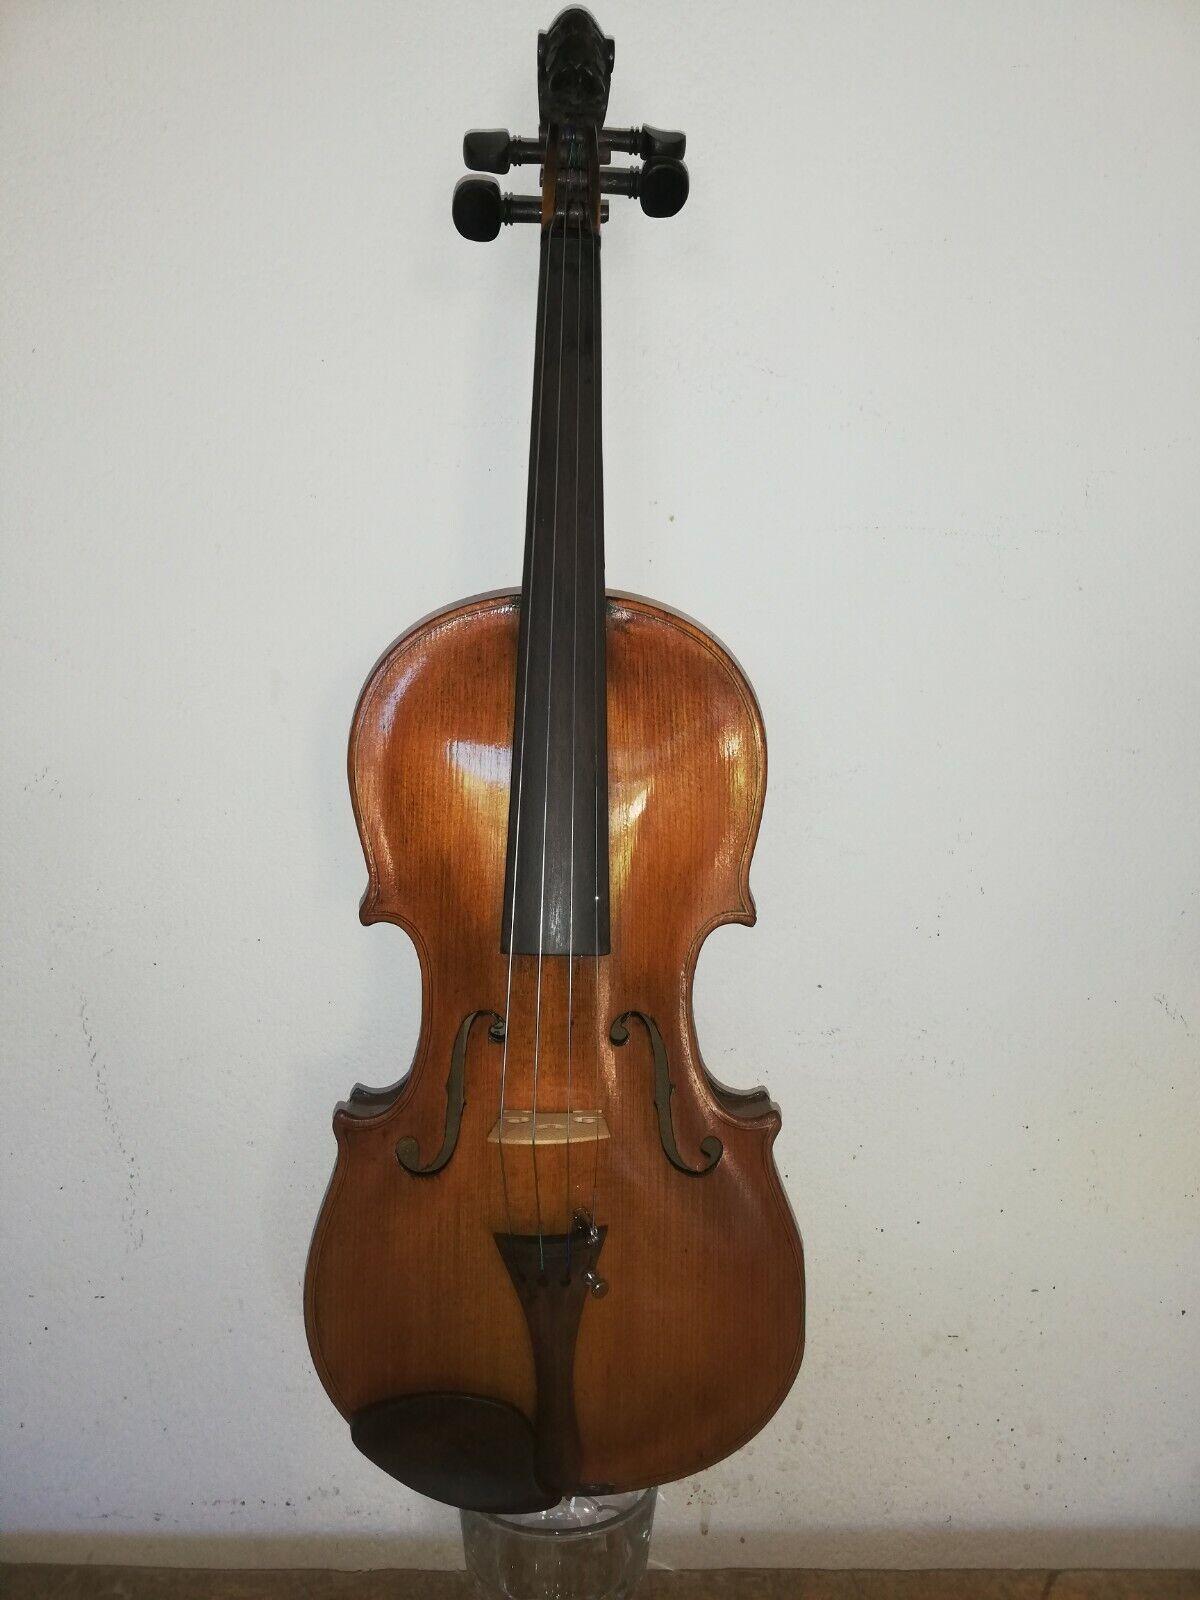 Violino Jacobus stainer antico 1900 4 4 vintage old Violin alte geige ARCO+CASE